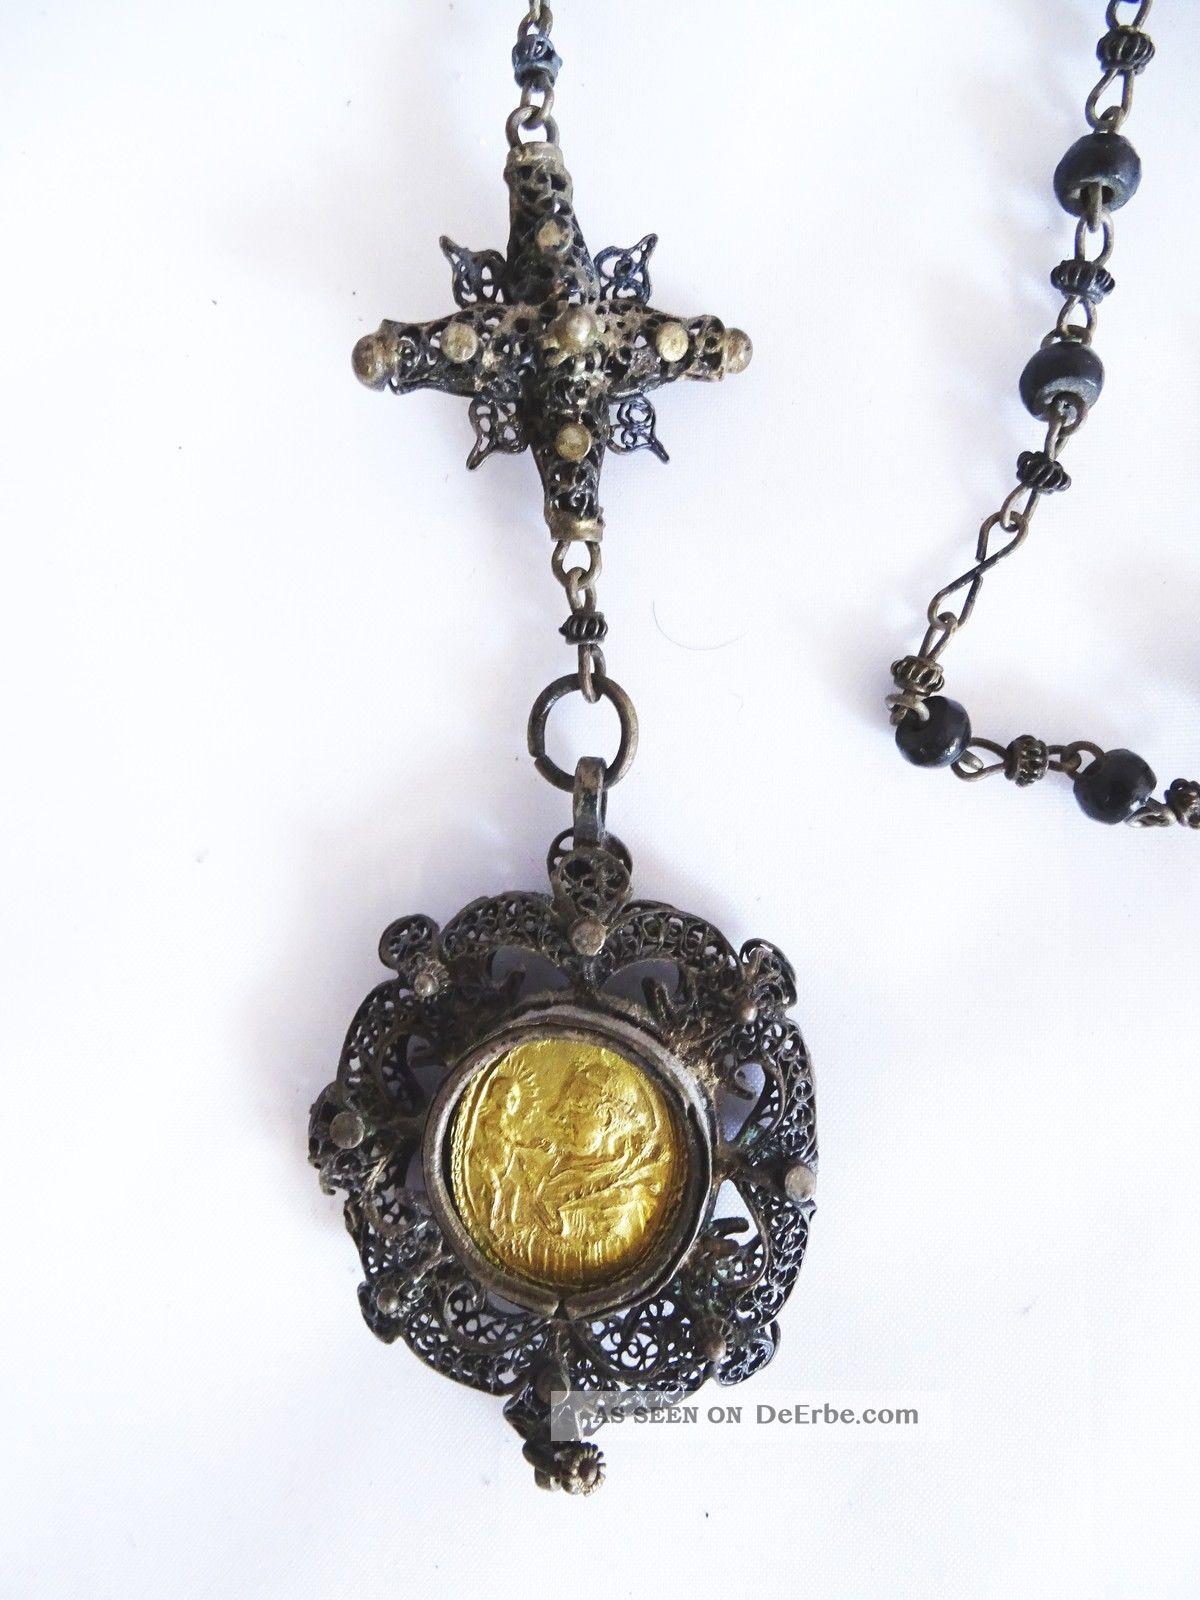 Antiker Sehr Früher Seltener Biedermeier Rosenkranz - Religiöse Rarität Rosenkränze Bild